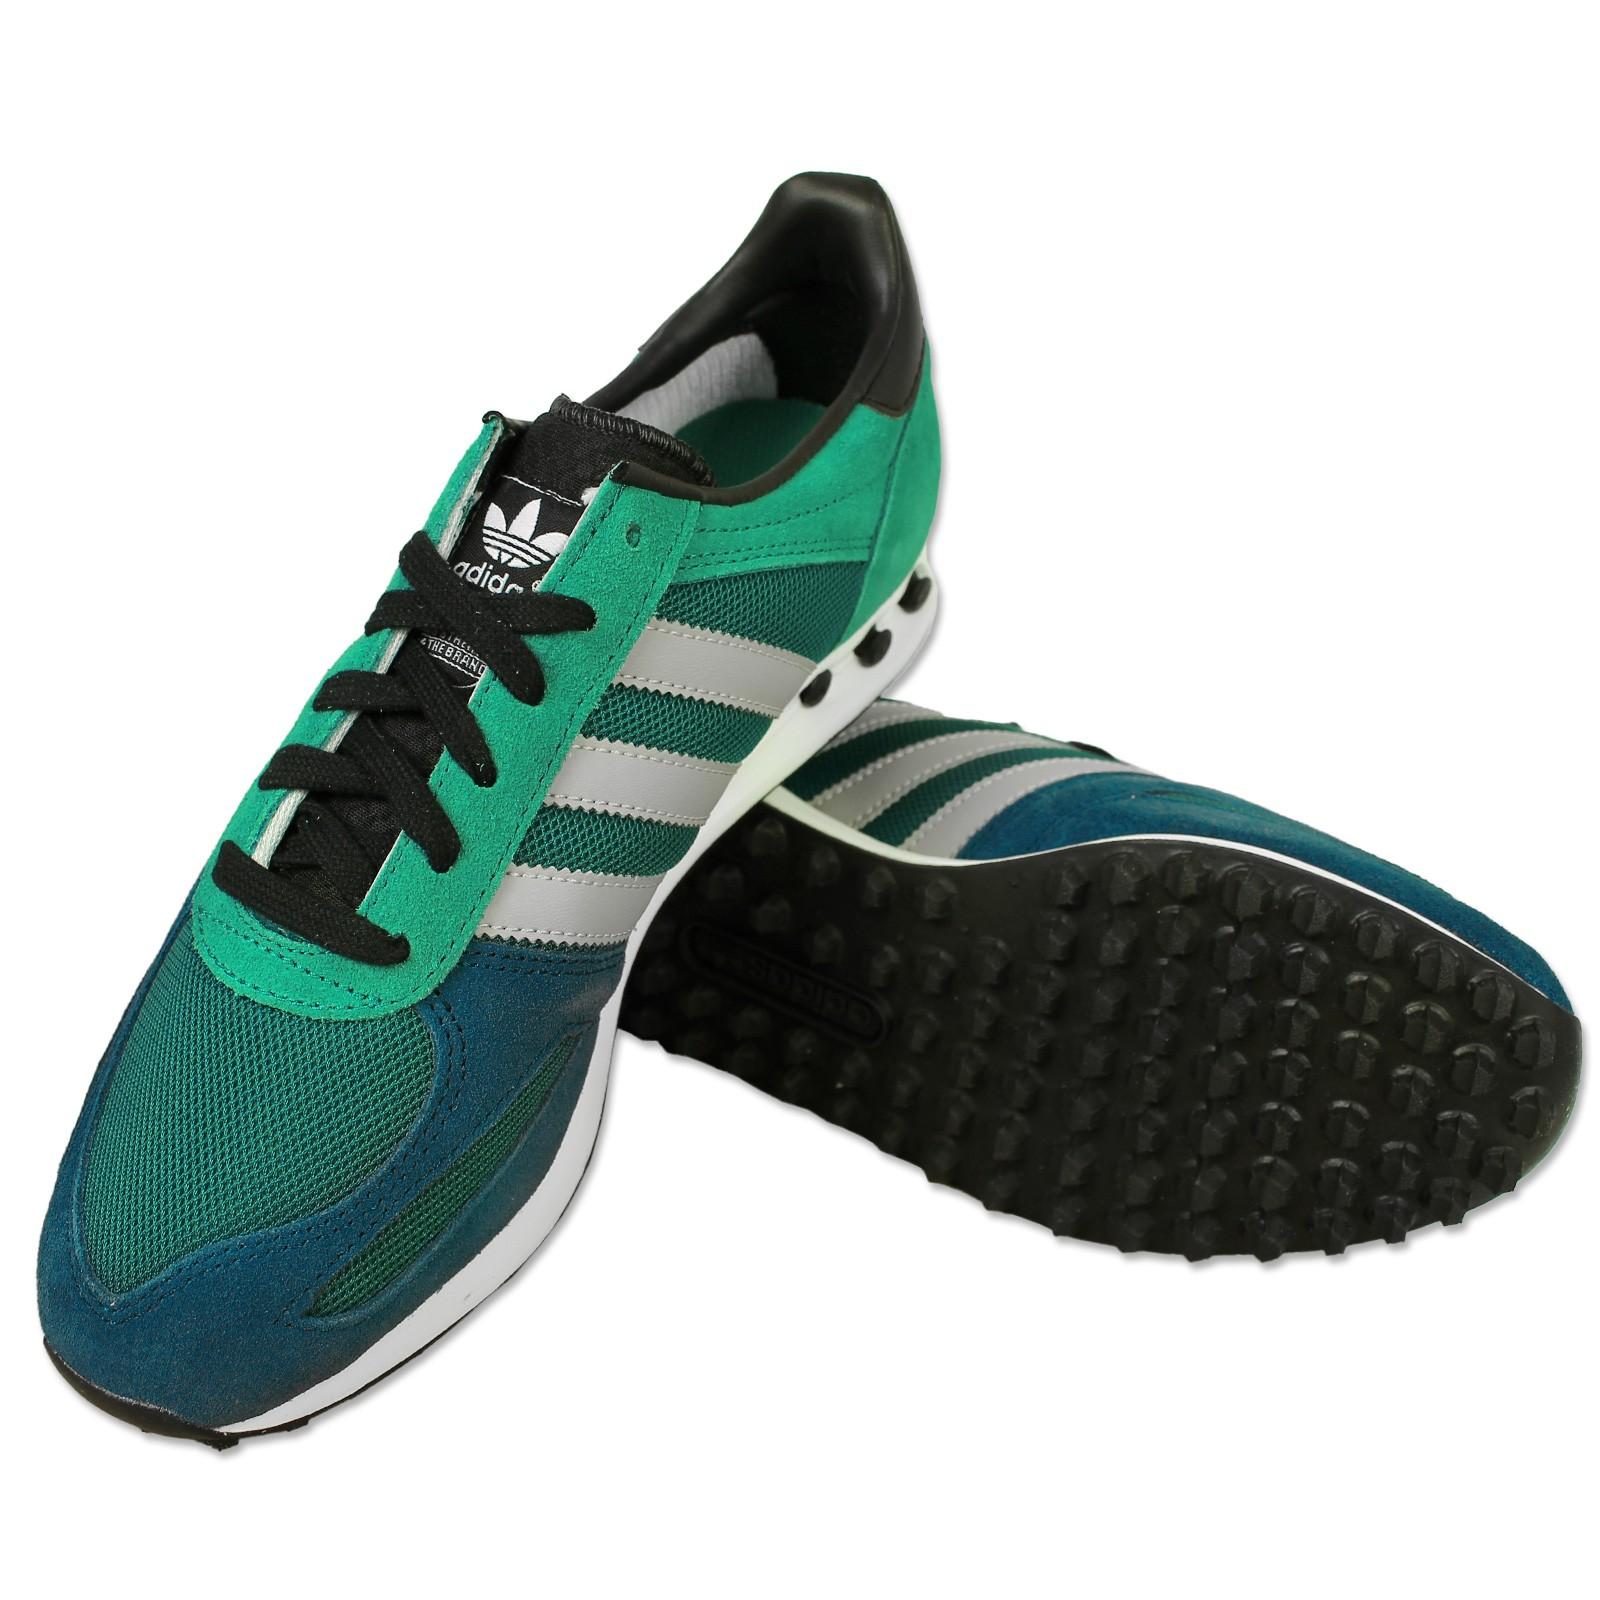 adidas originals mens la trainer trainers s79042 shoe. Black Bedroom Furniture Sets. Home Design Ideas